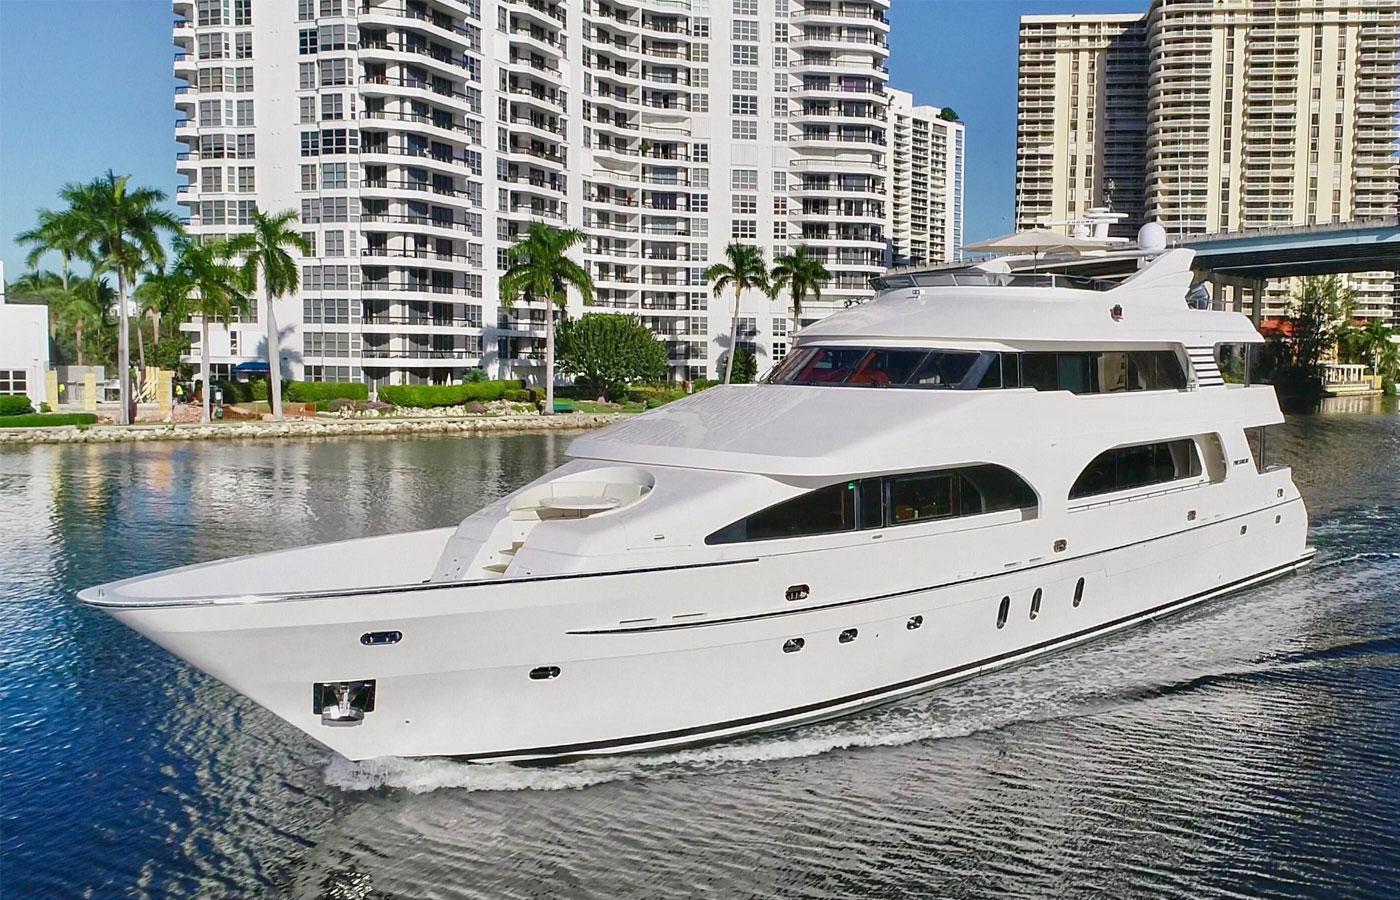 SOLD: 107′ President 2008 By Yacht Broker Will Noftsinger